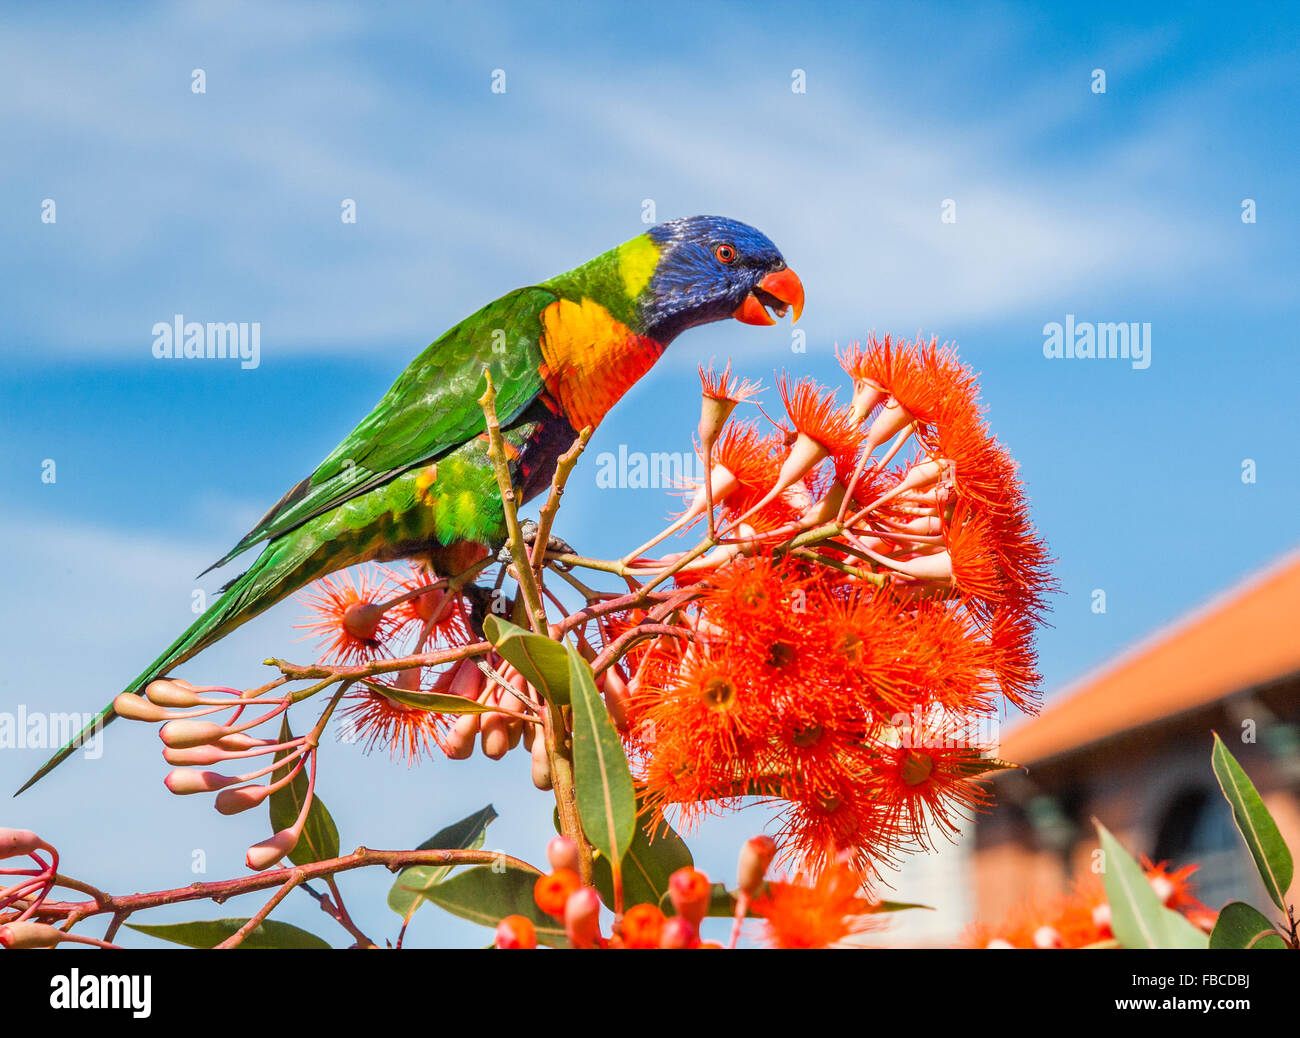 Rainbow Lorikeet feasting on a Red flowering gum - Stock Image